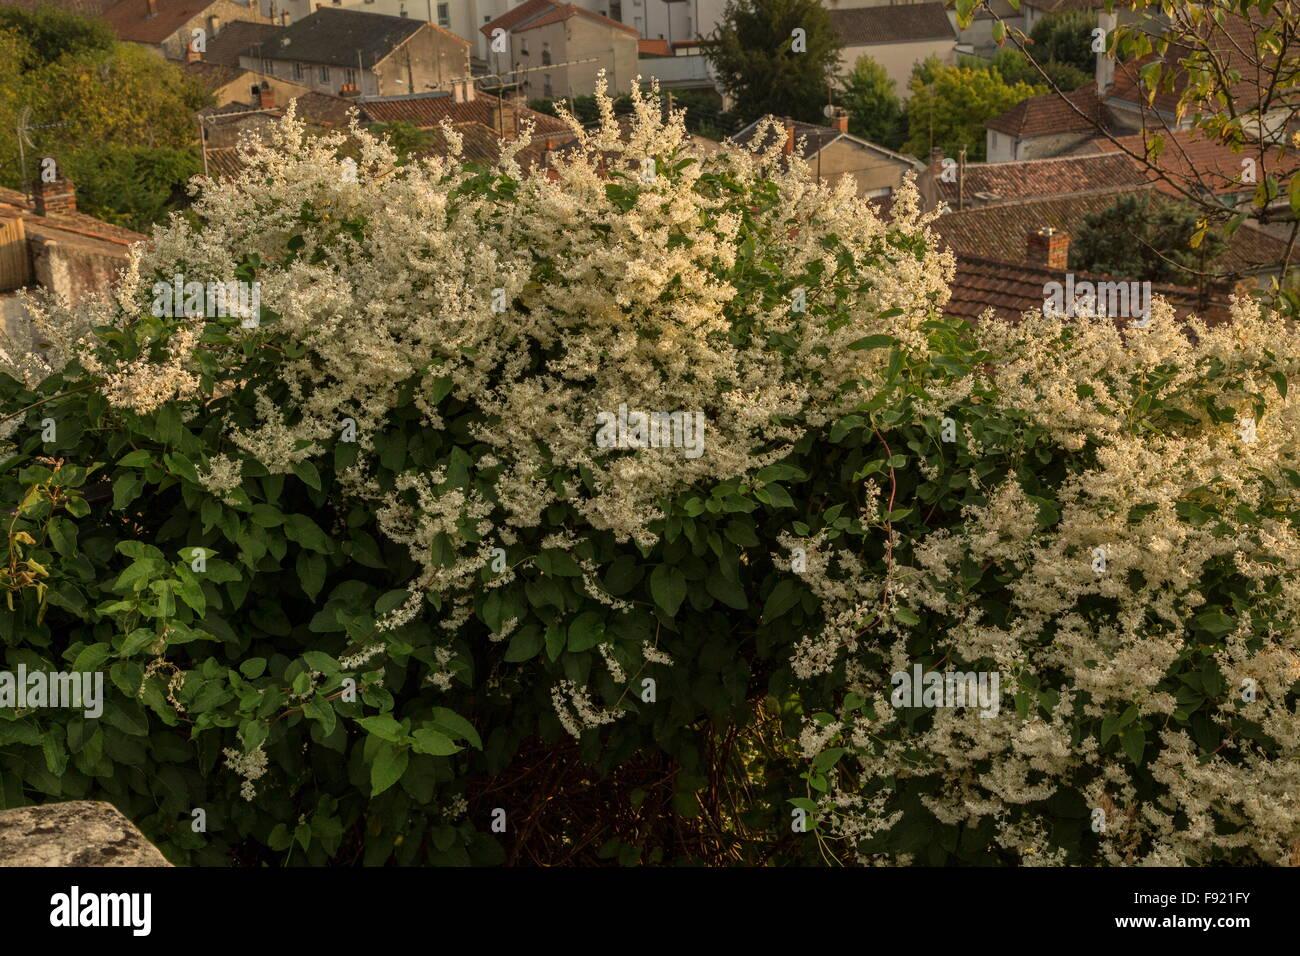 Russian-vine, Fallopia baldschuanica, in full flower. - Stock Image